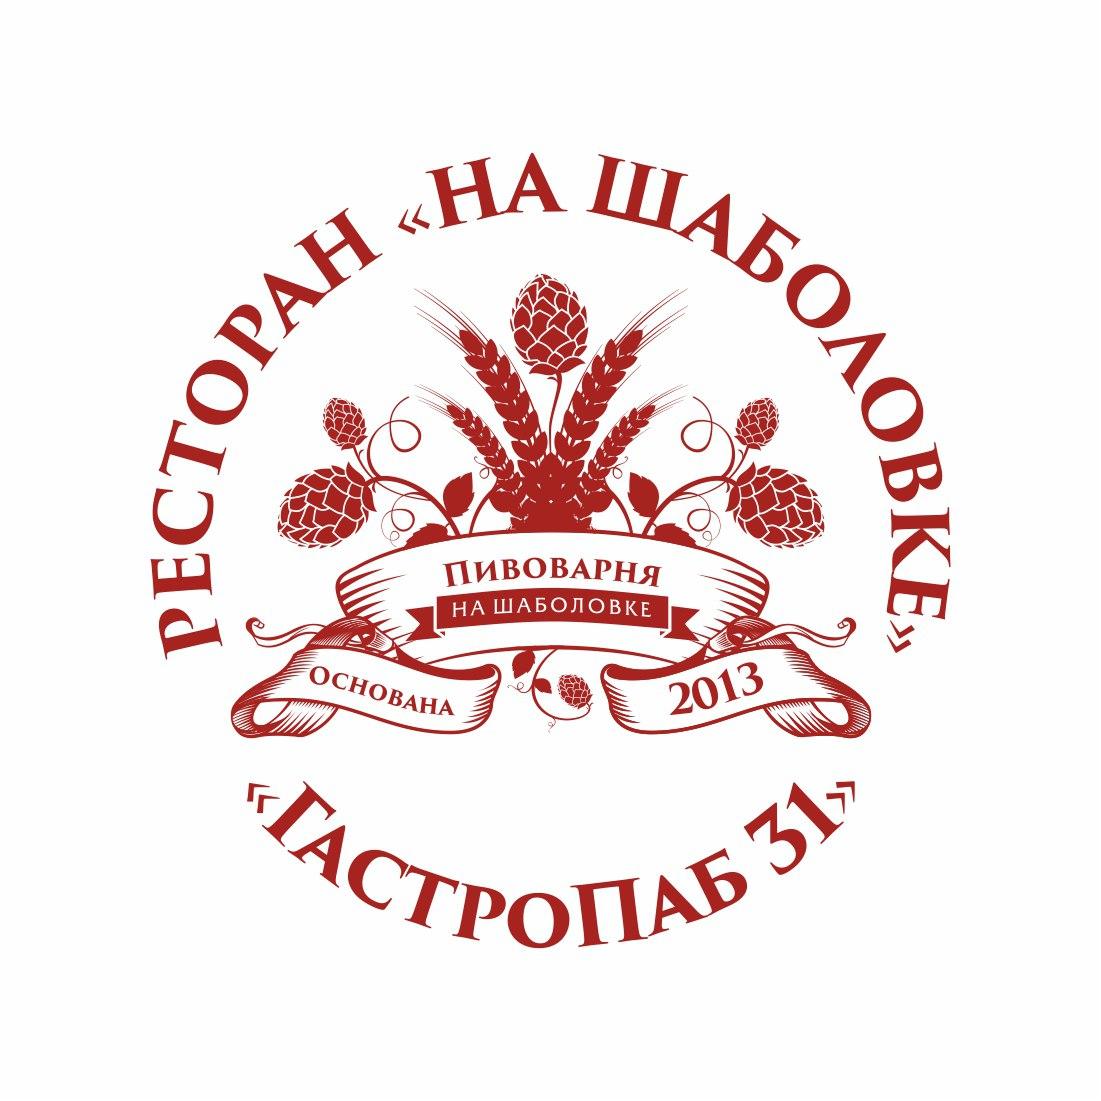 Логотип площадки На Шаболовке